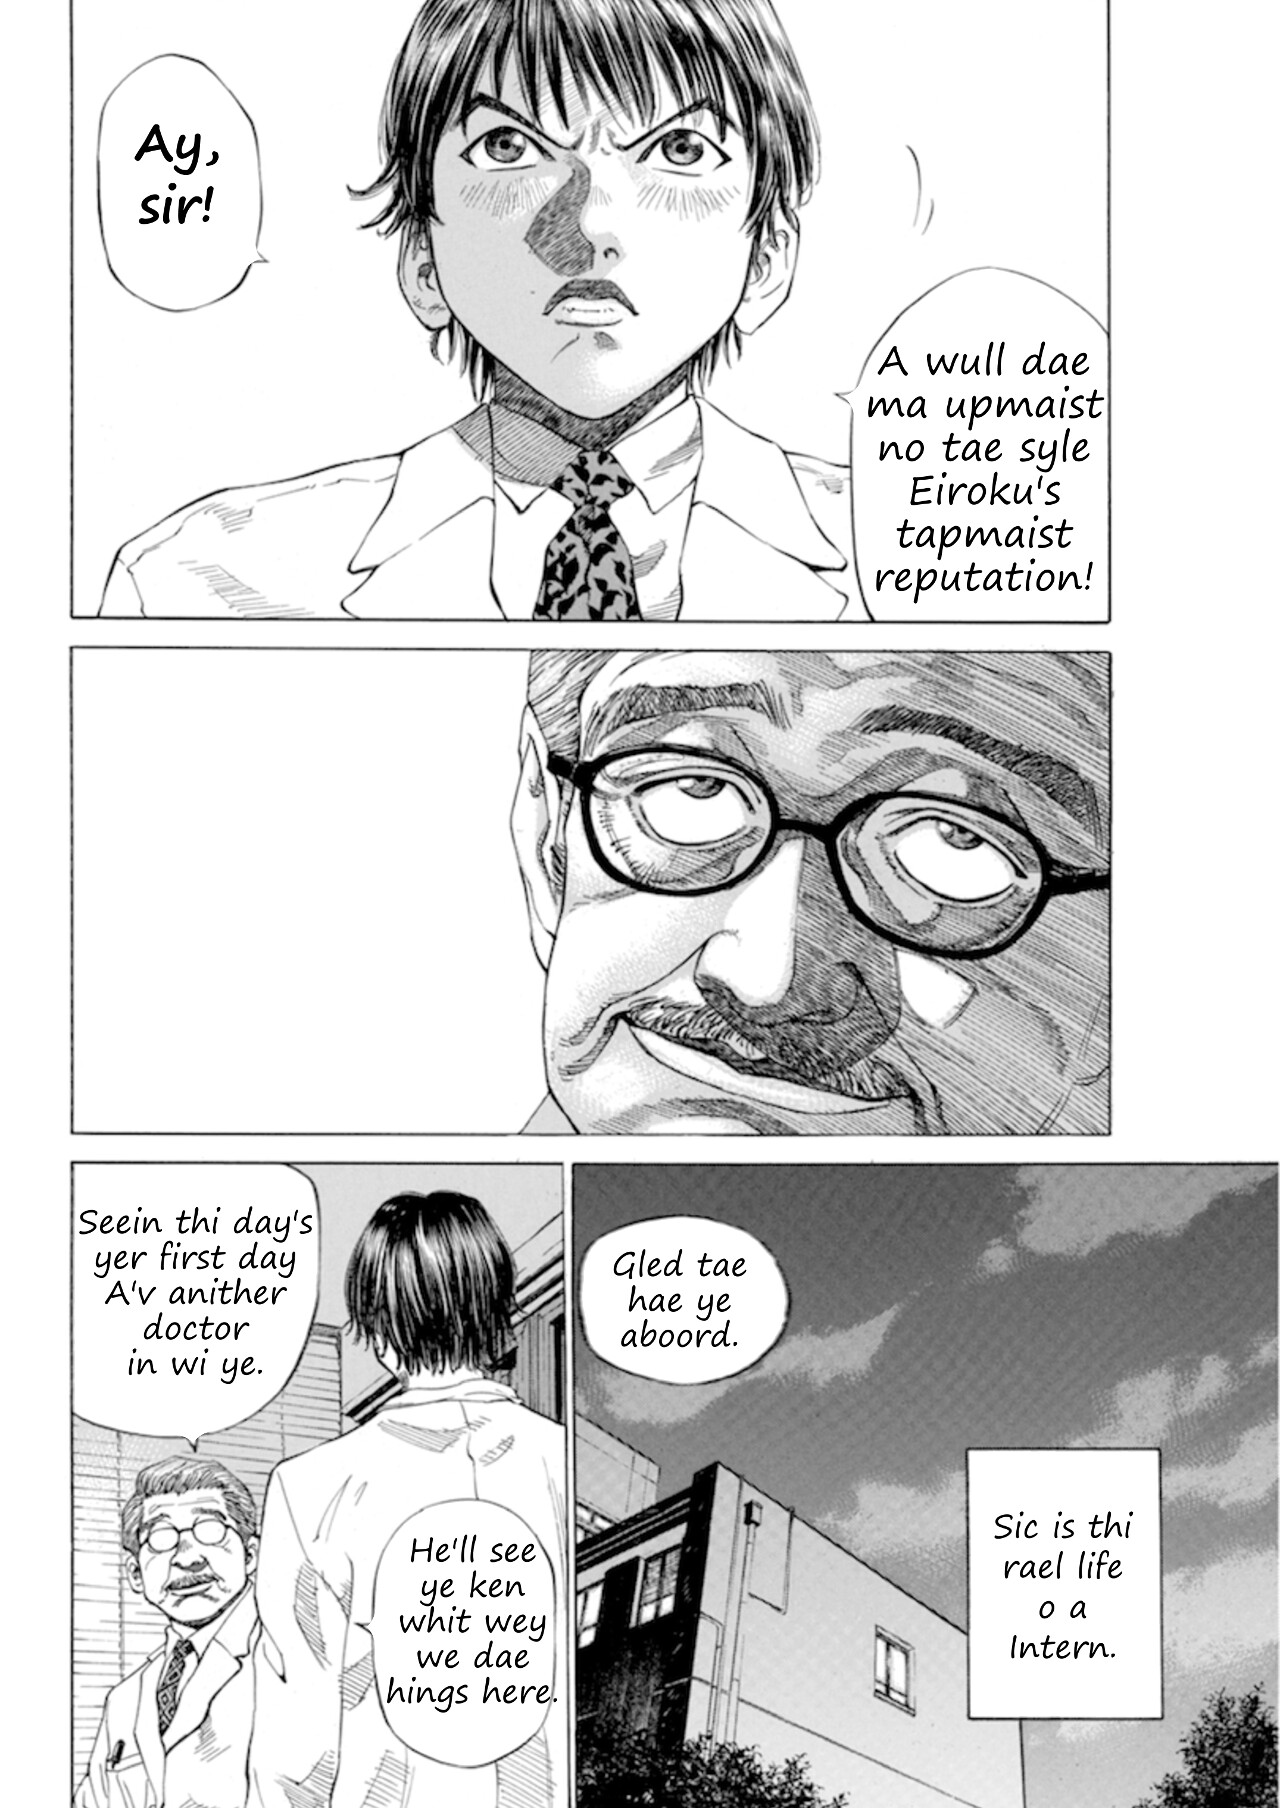 Jock-Dhu-Scots-manga-01-013